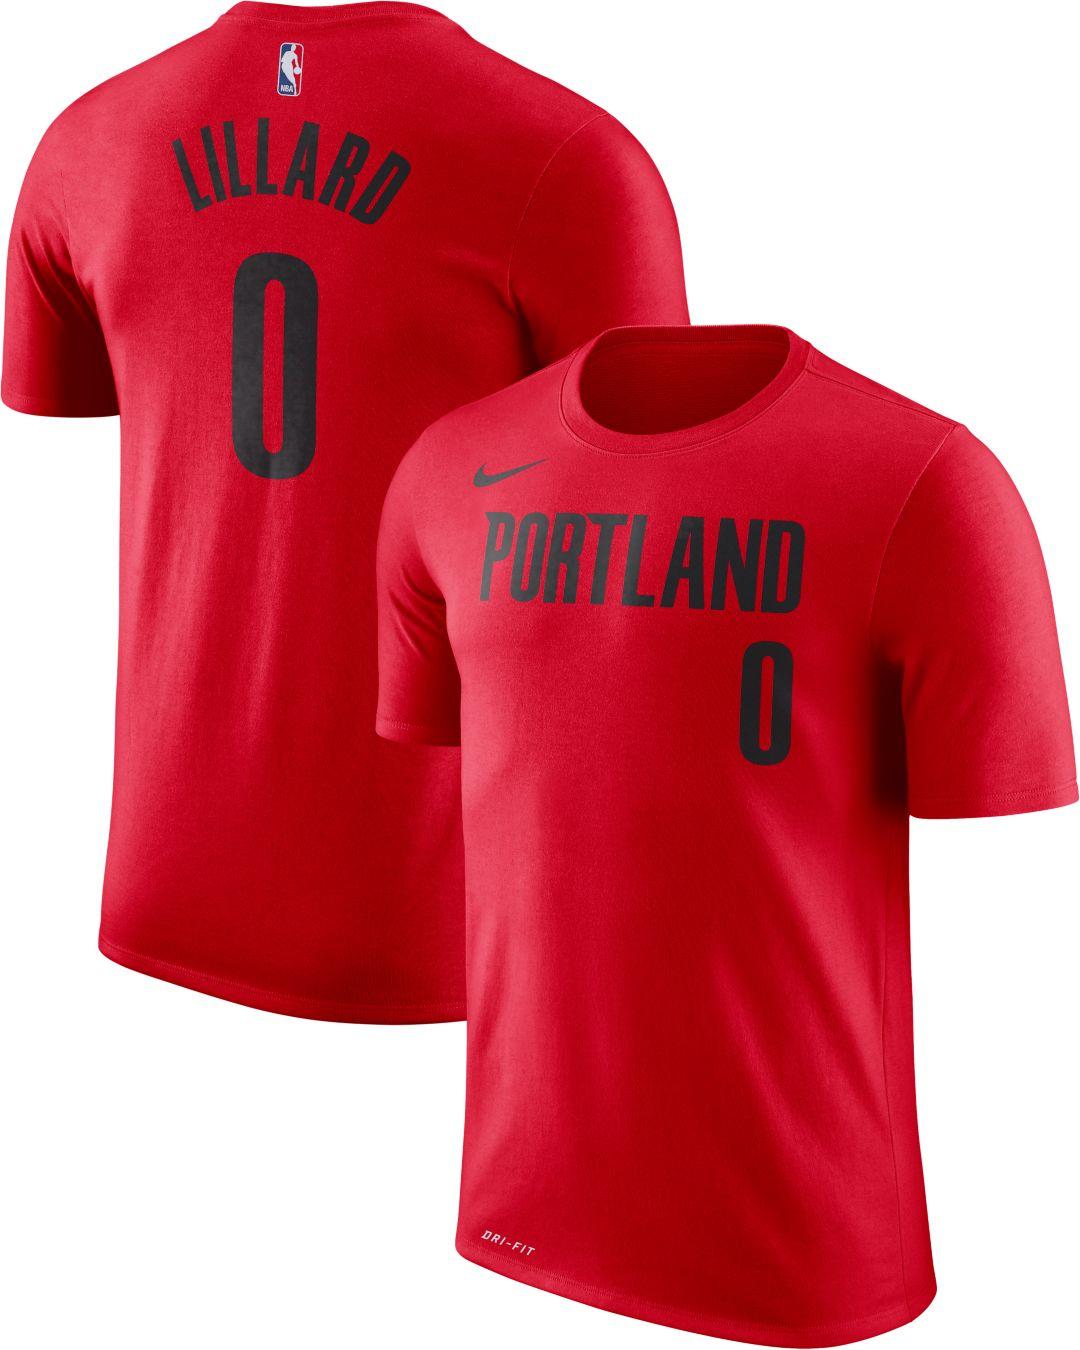 low priced 63690 3c6c6 Nike Youth Portland Trail Blazers Damian Lillard #0 Dri-FIT Red T-Shirt